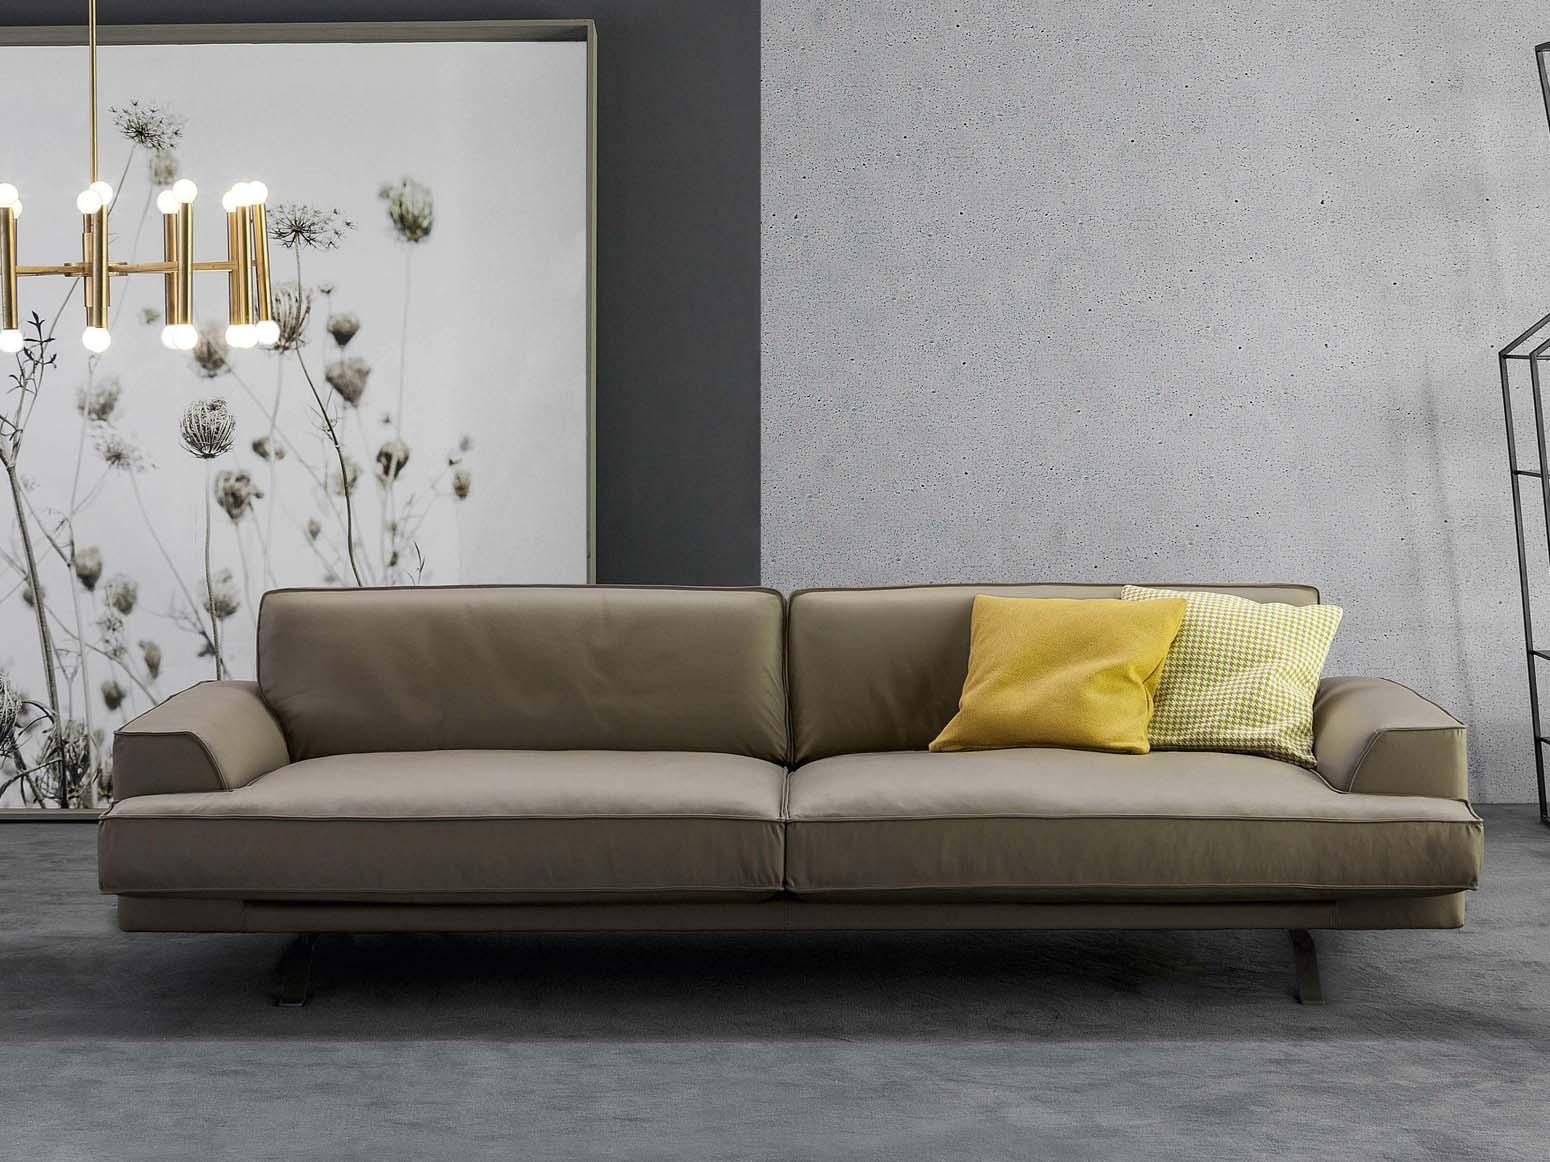 Bonaldo Design My Way : Il decor furniture: slab sectional bonaldo italy